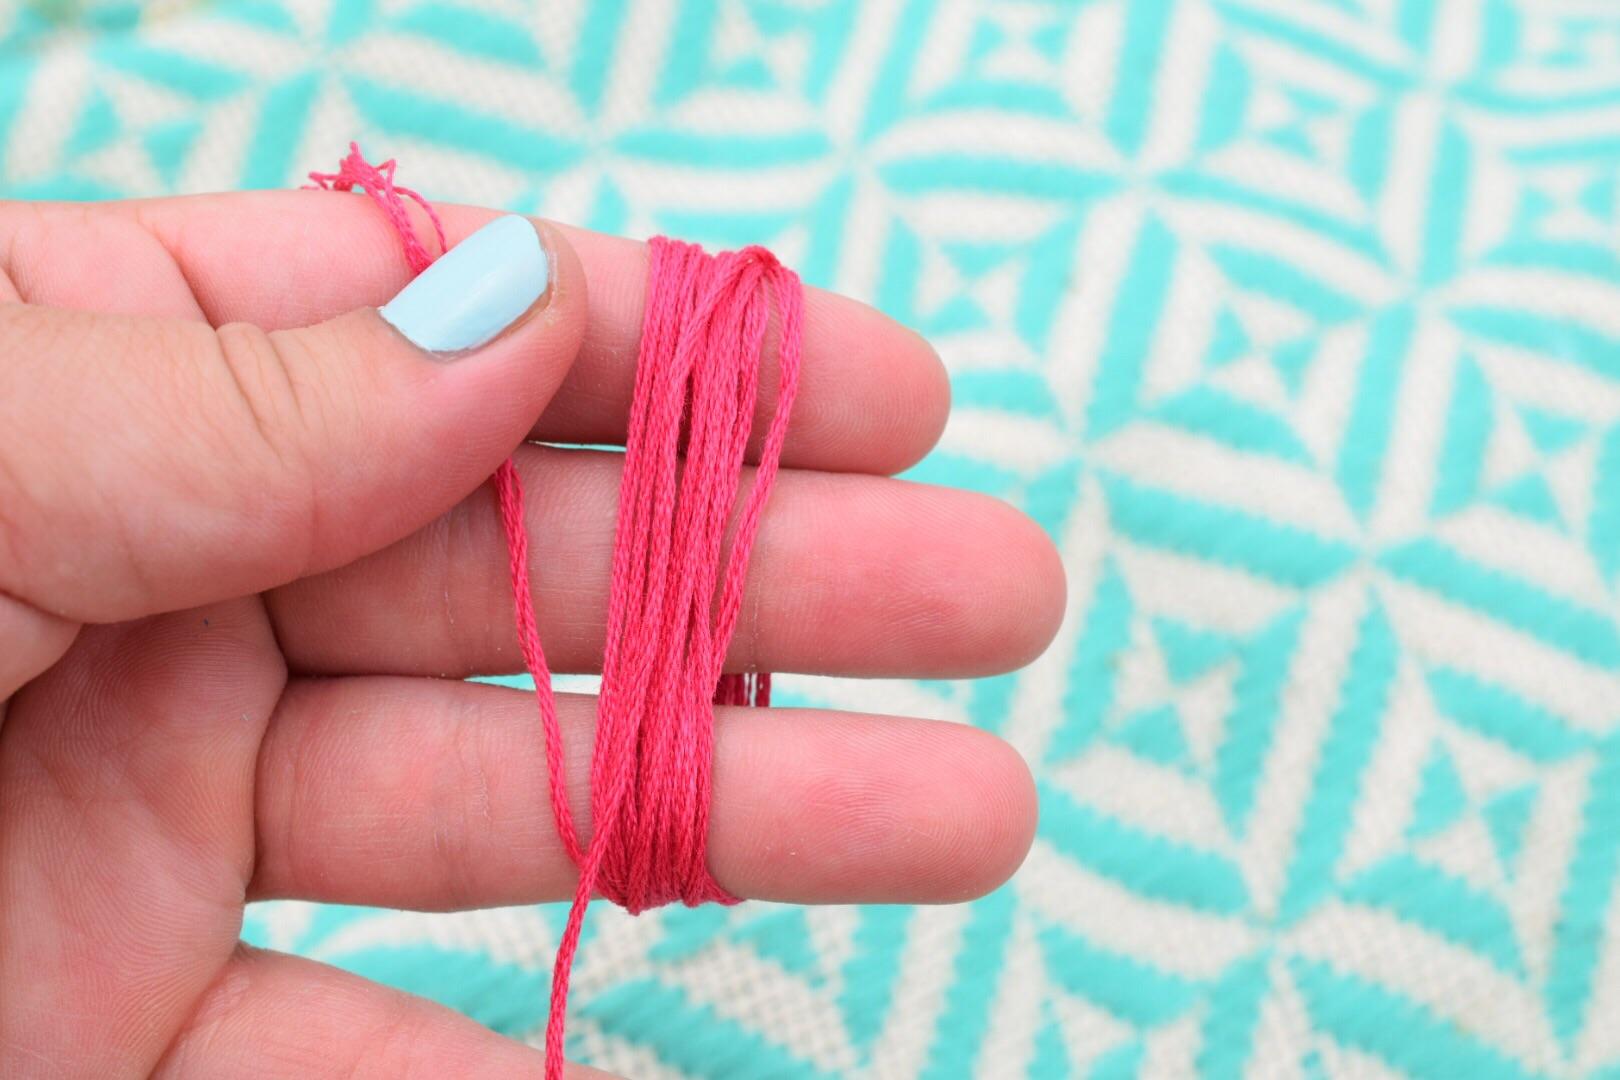 I used 1/3 of the string for each tassel.